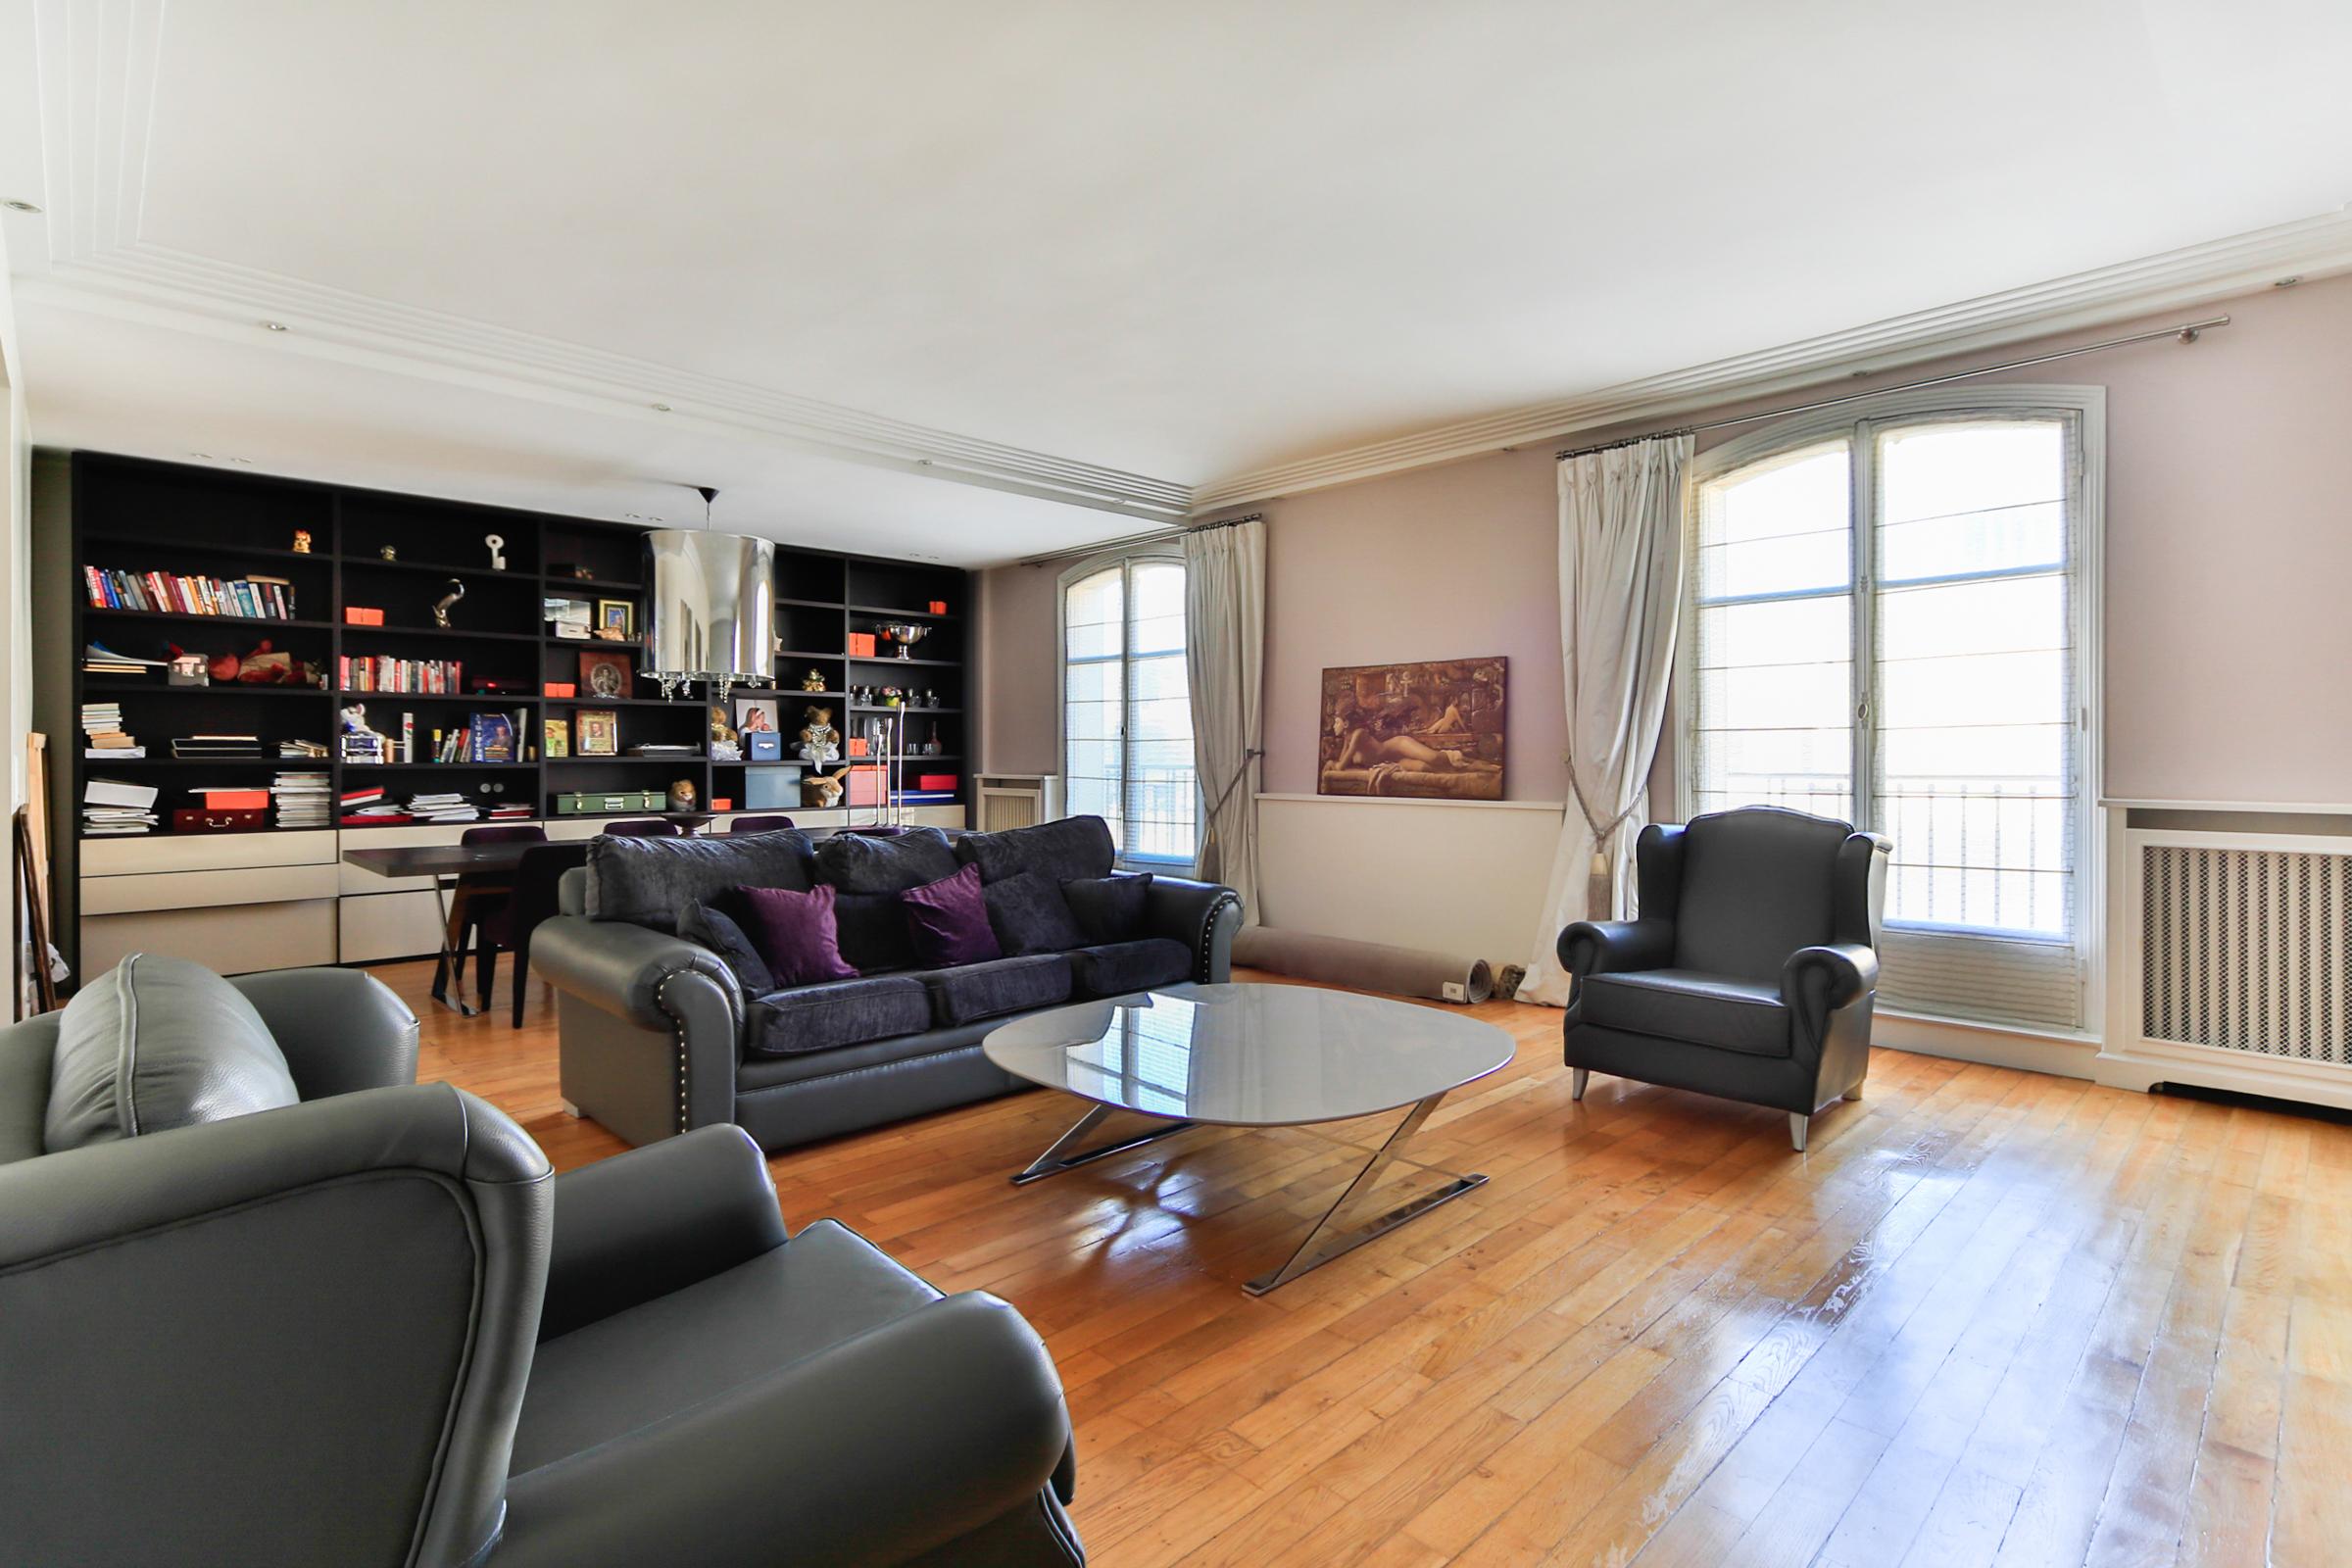 Property For Sale at Apartment - Saint James